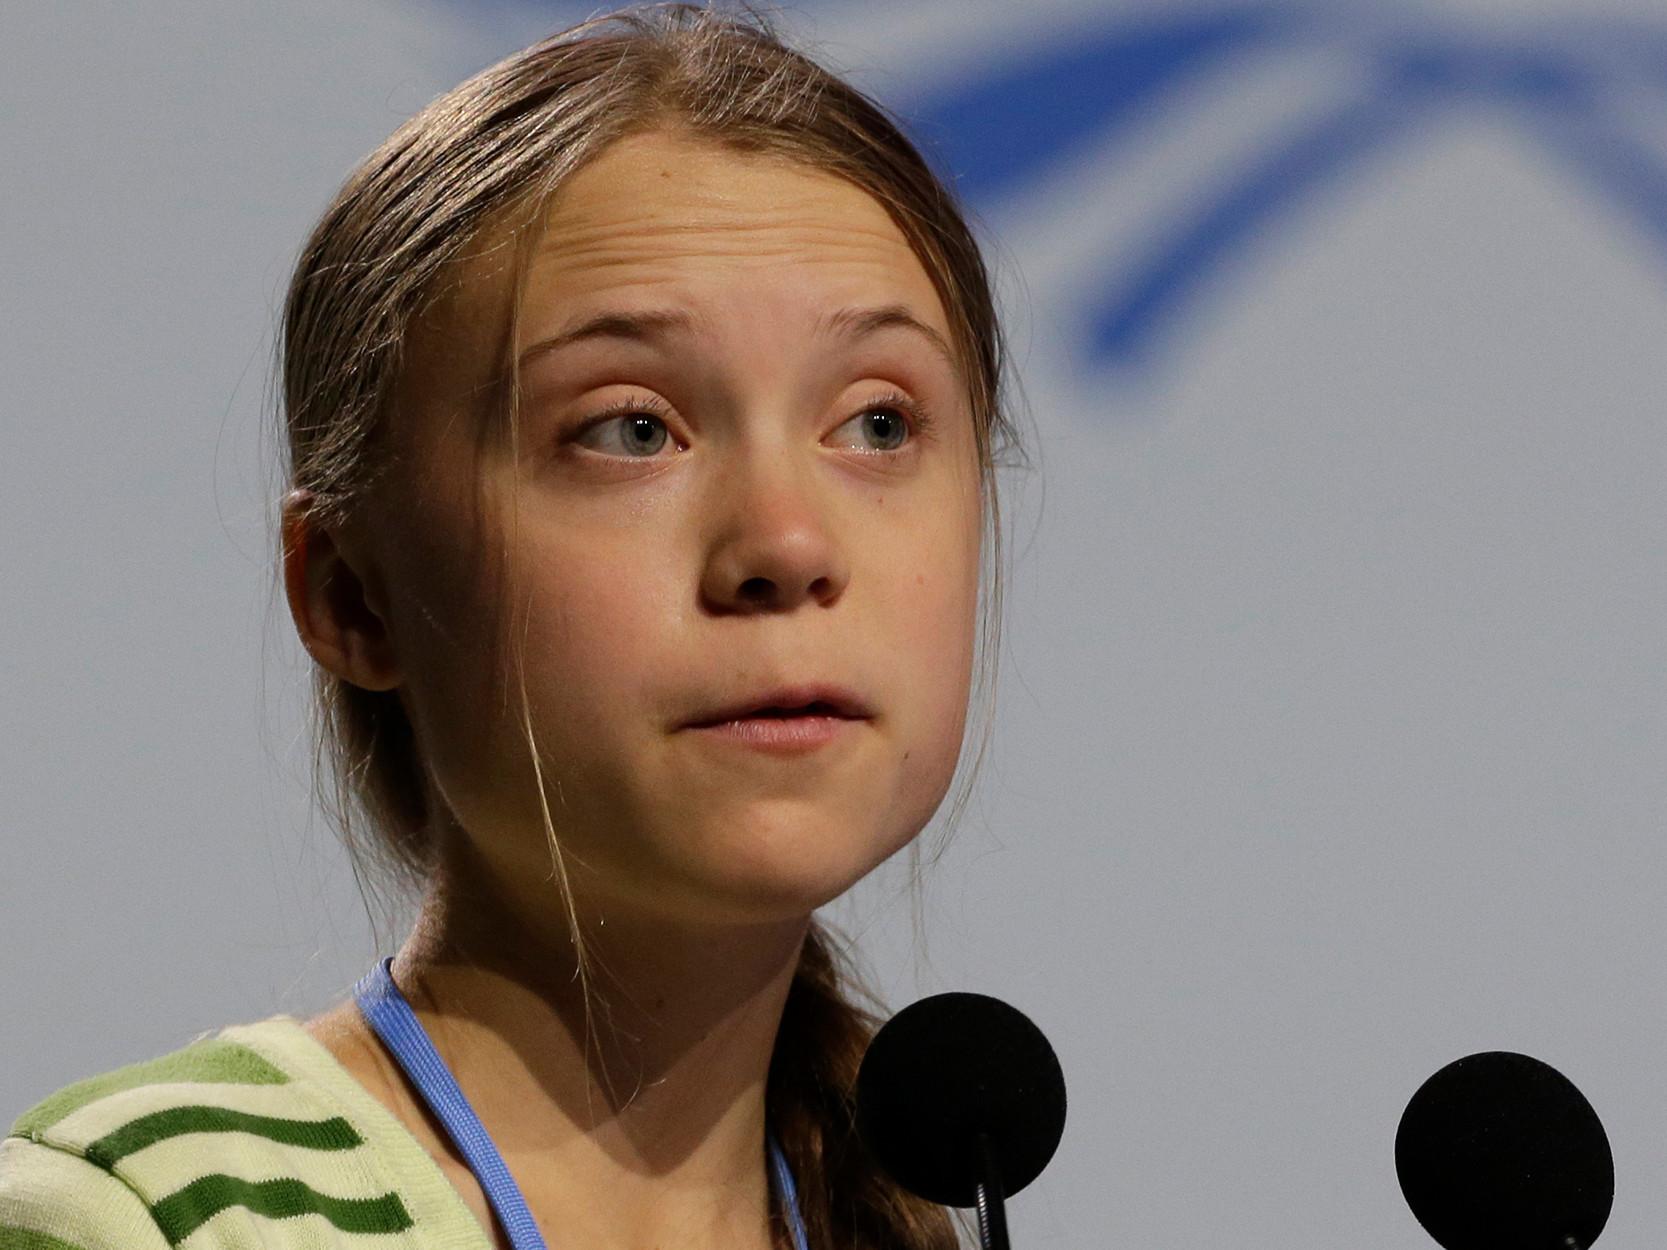 Greta Thunberg mocks Trump over 'chill' tweet